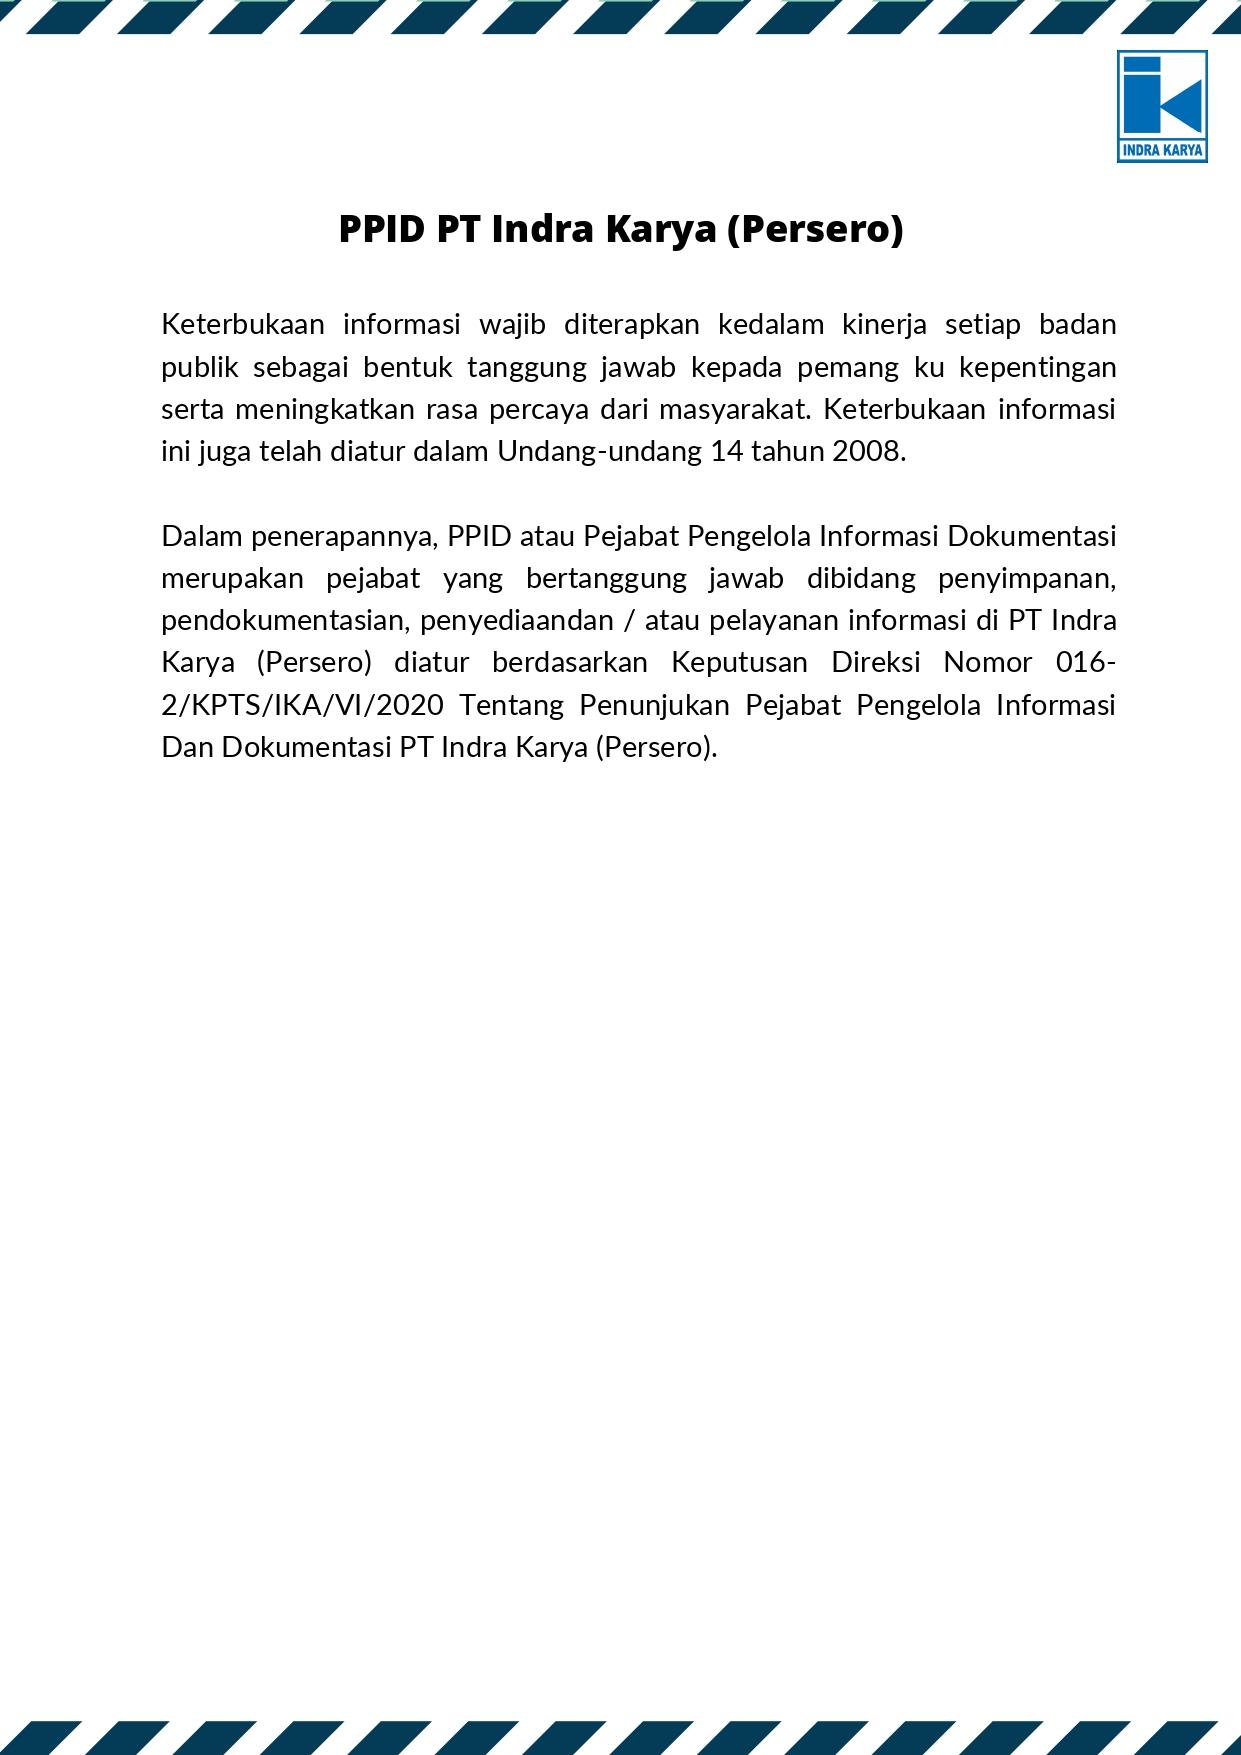 PPID Indra Karya